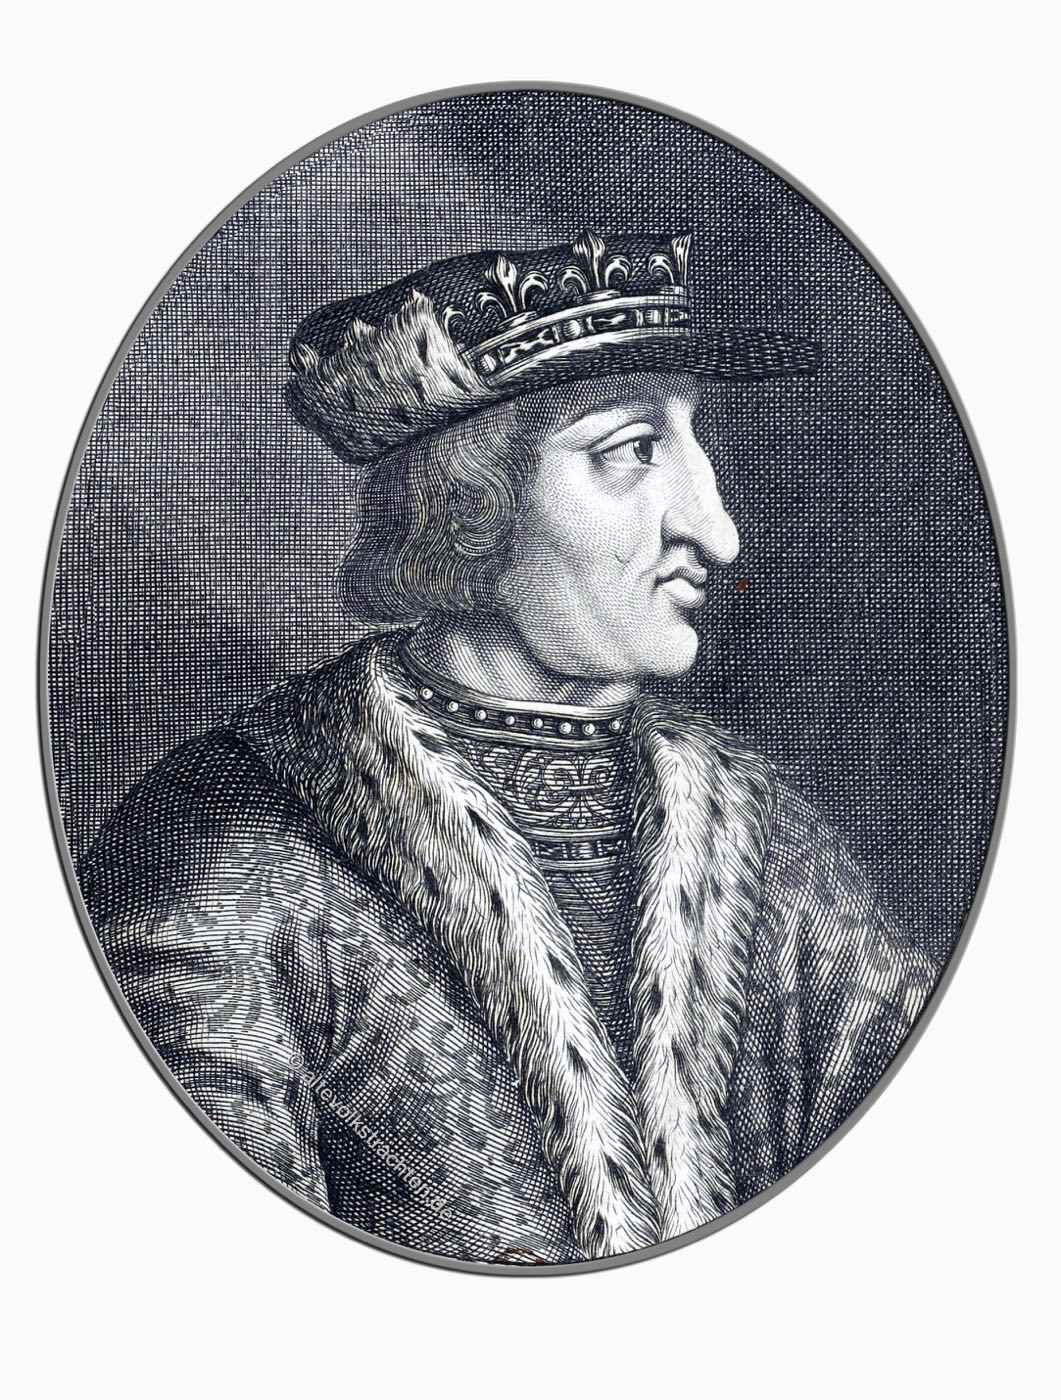 Karl VI, König, Frankreich, Mittelalter, Larmessin, Gotik, Druckgrafik